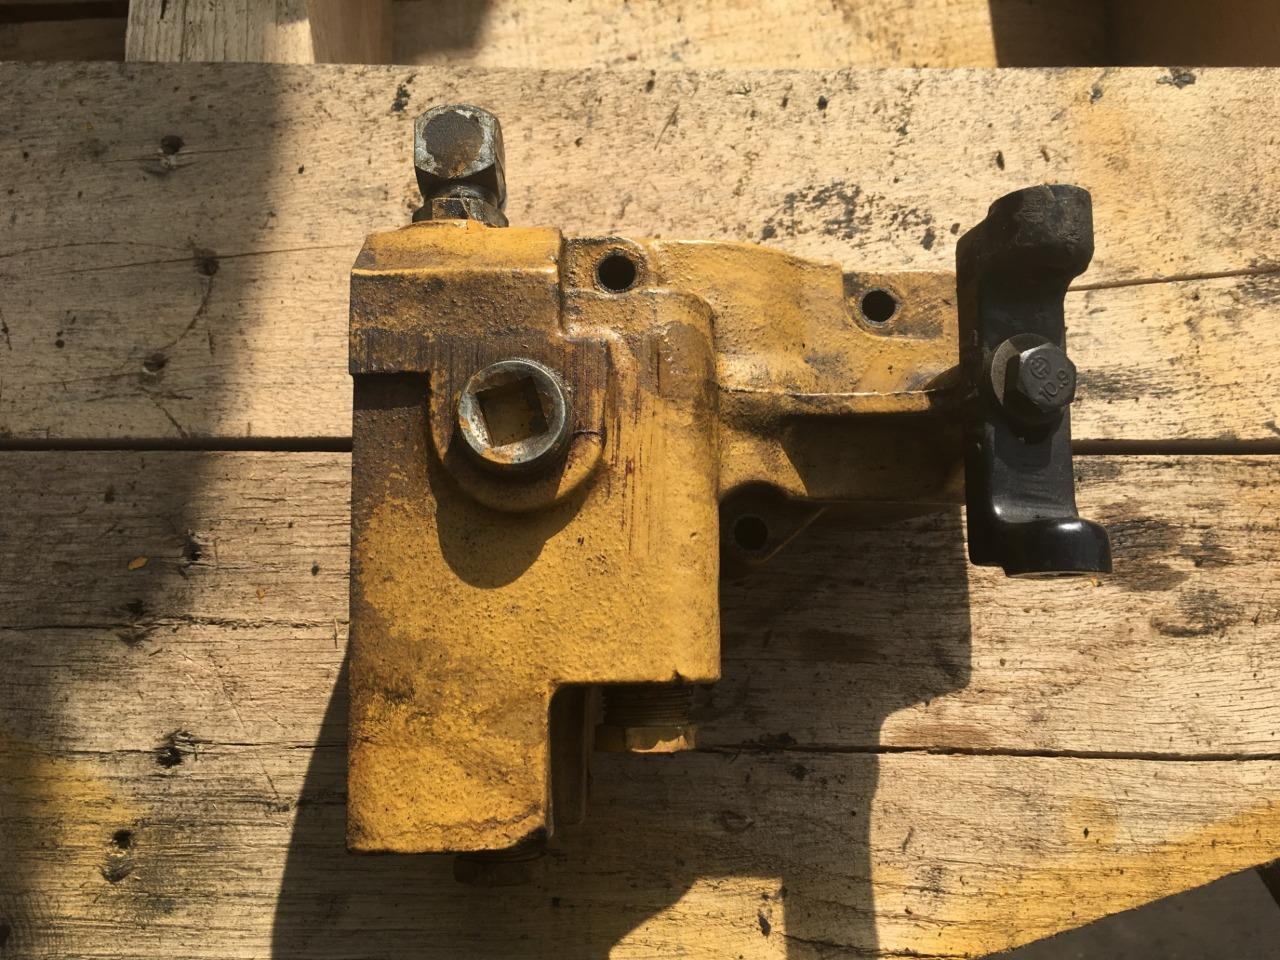 Caterpillar 3126 Diesel Engine OEM and 32 similar items